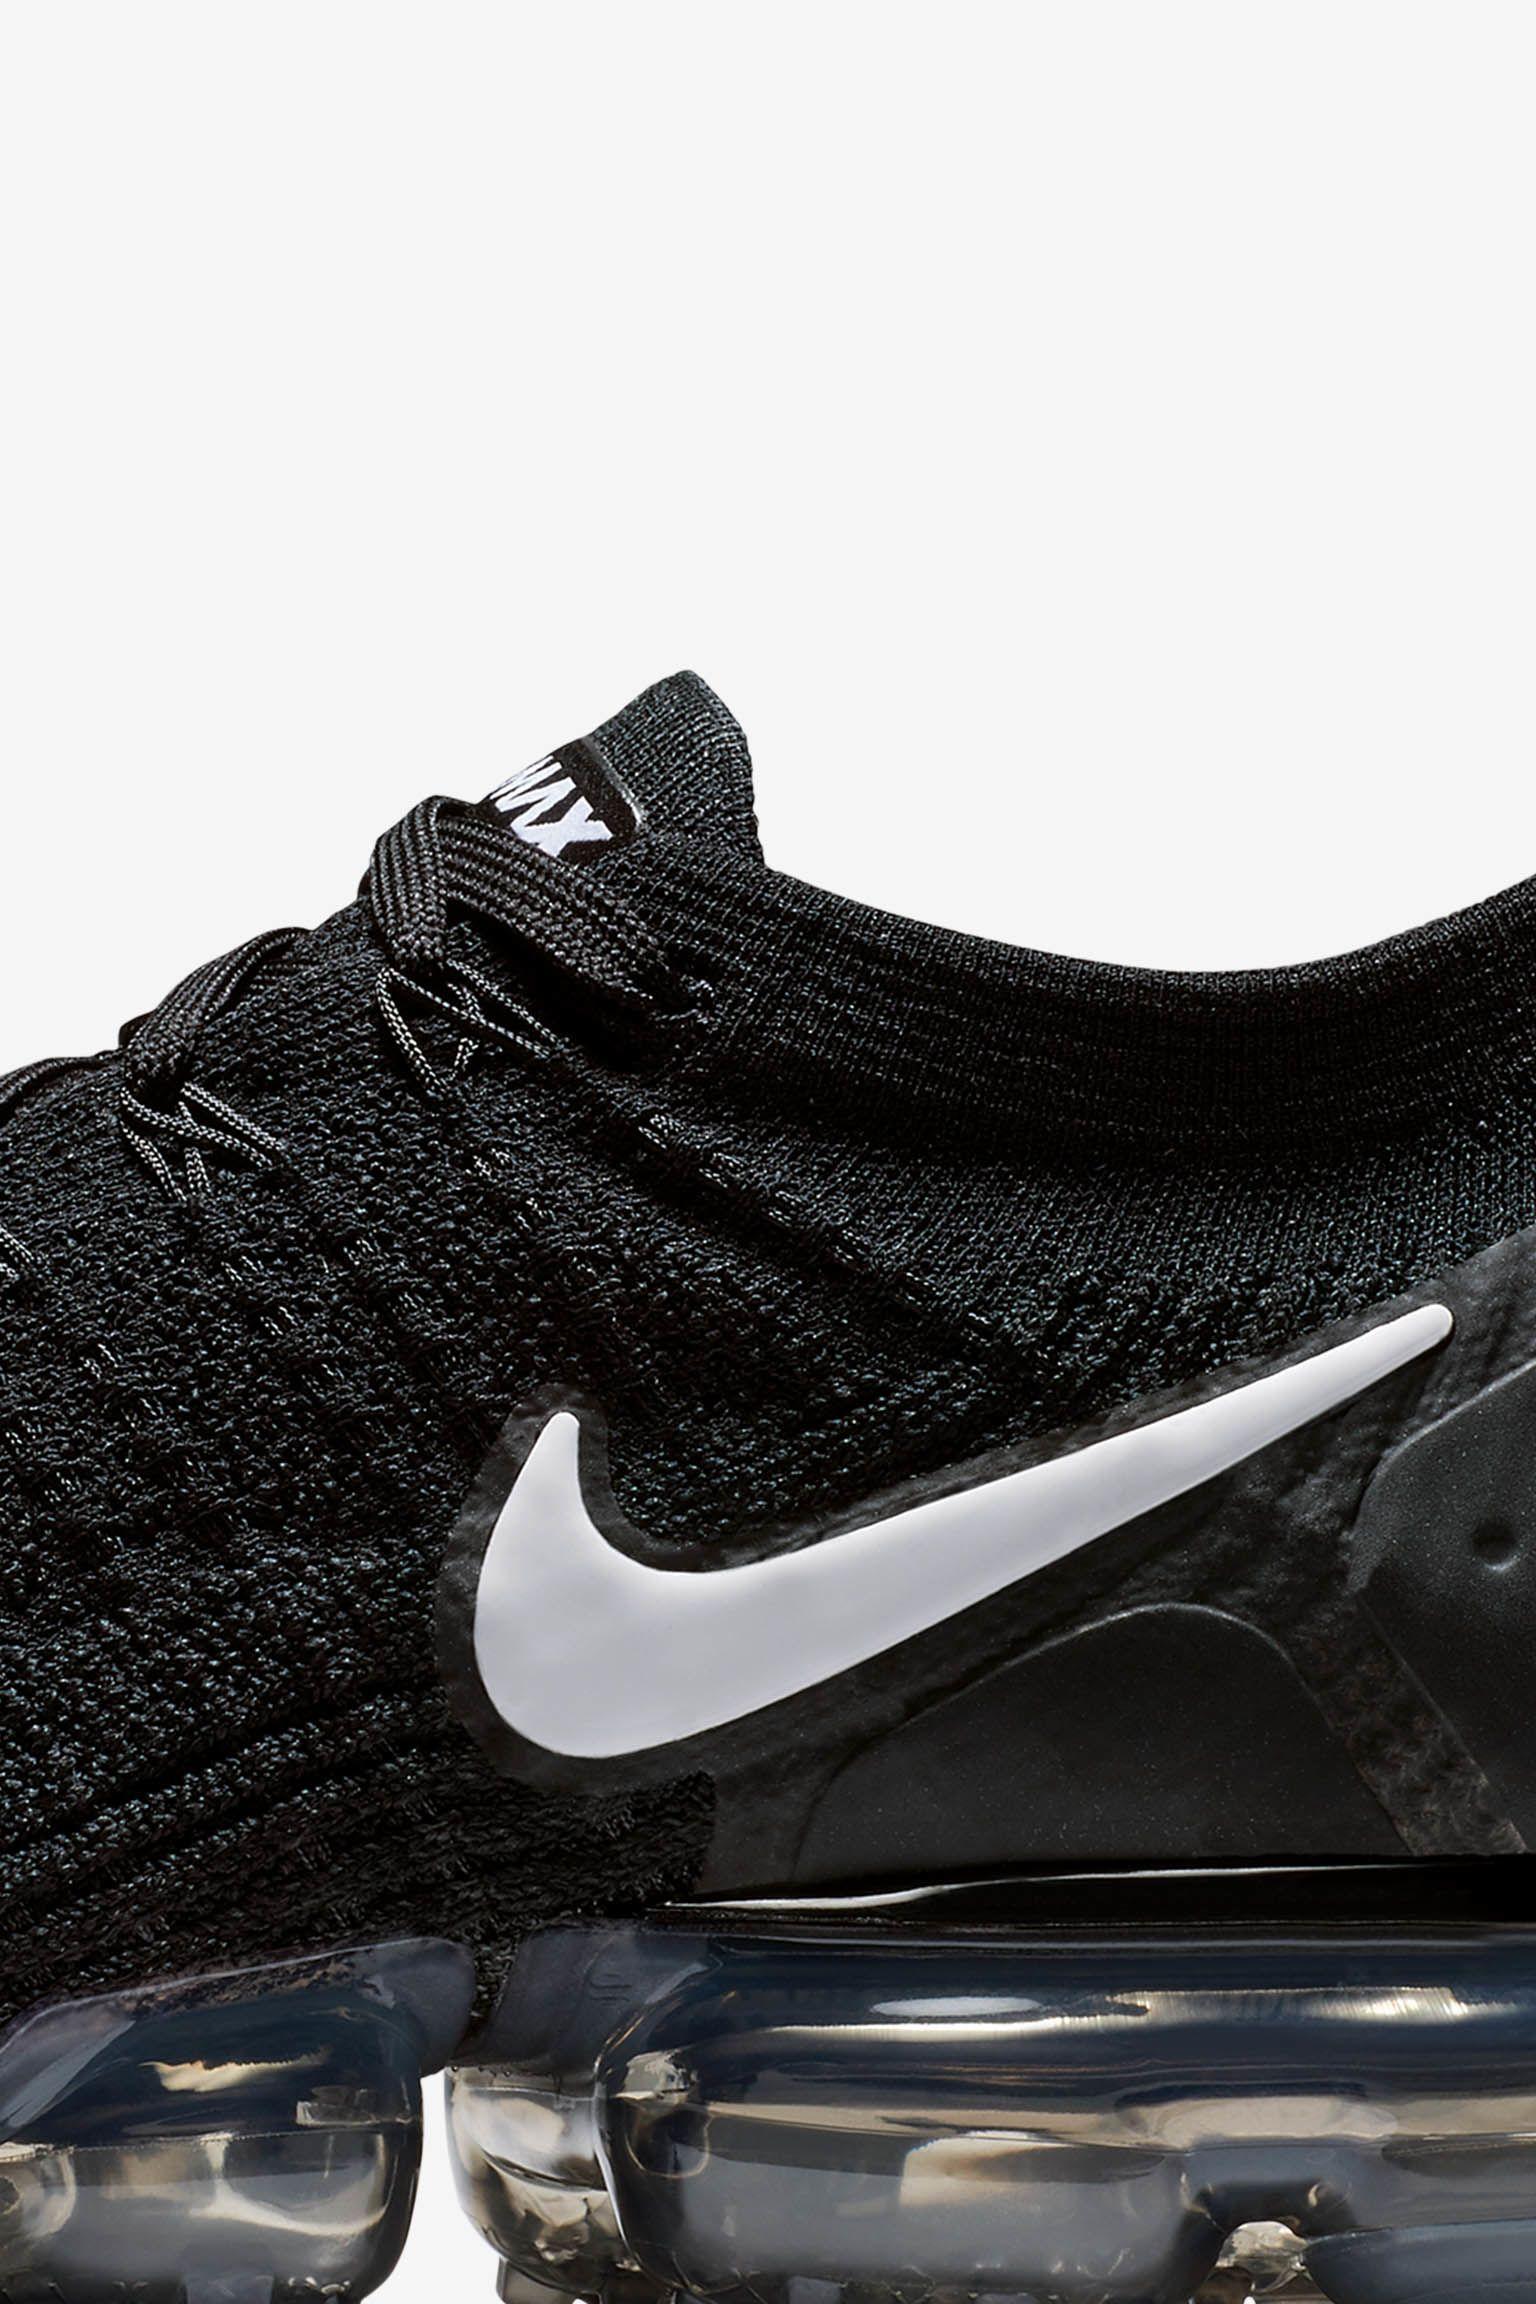 Nike Air Vapormax Flyknit 2 'Black & Dark Grey' Release Date